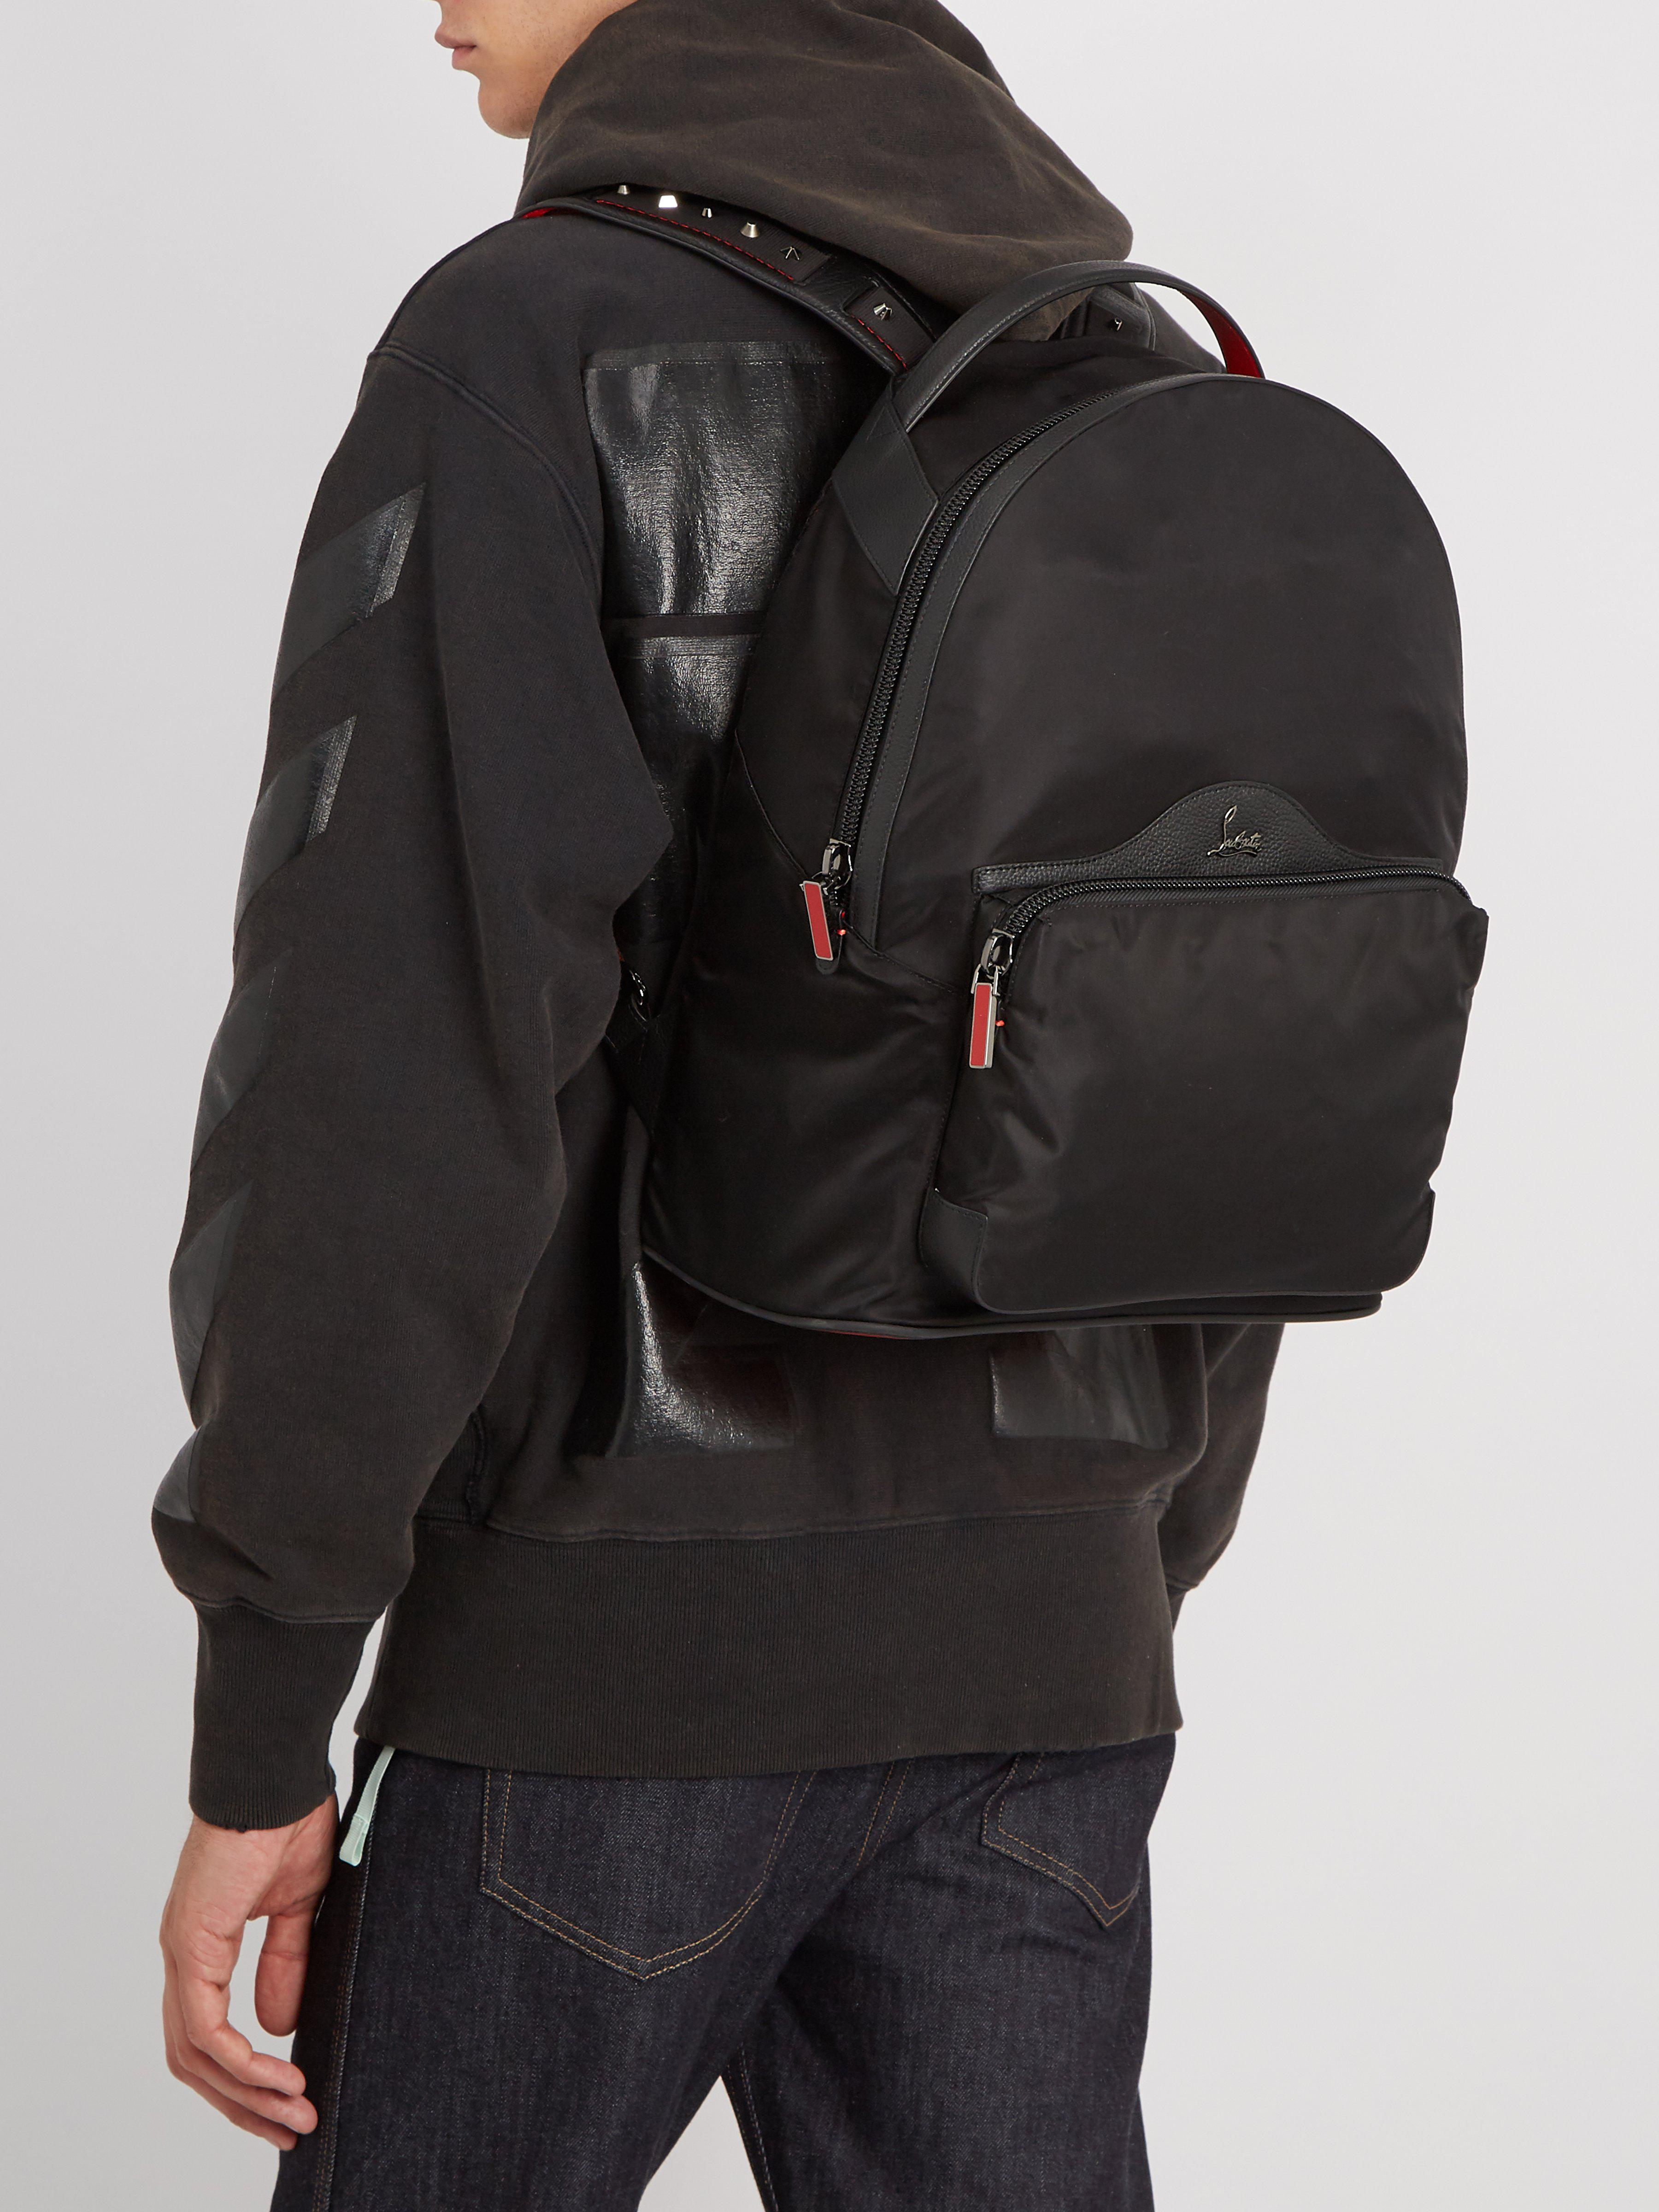 c5f9b1a578c Christian Louboutin Backloubi Spike Embellished Backpack in Black for Men -  Lyst